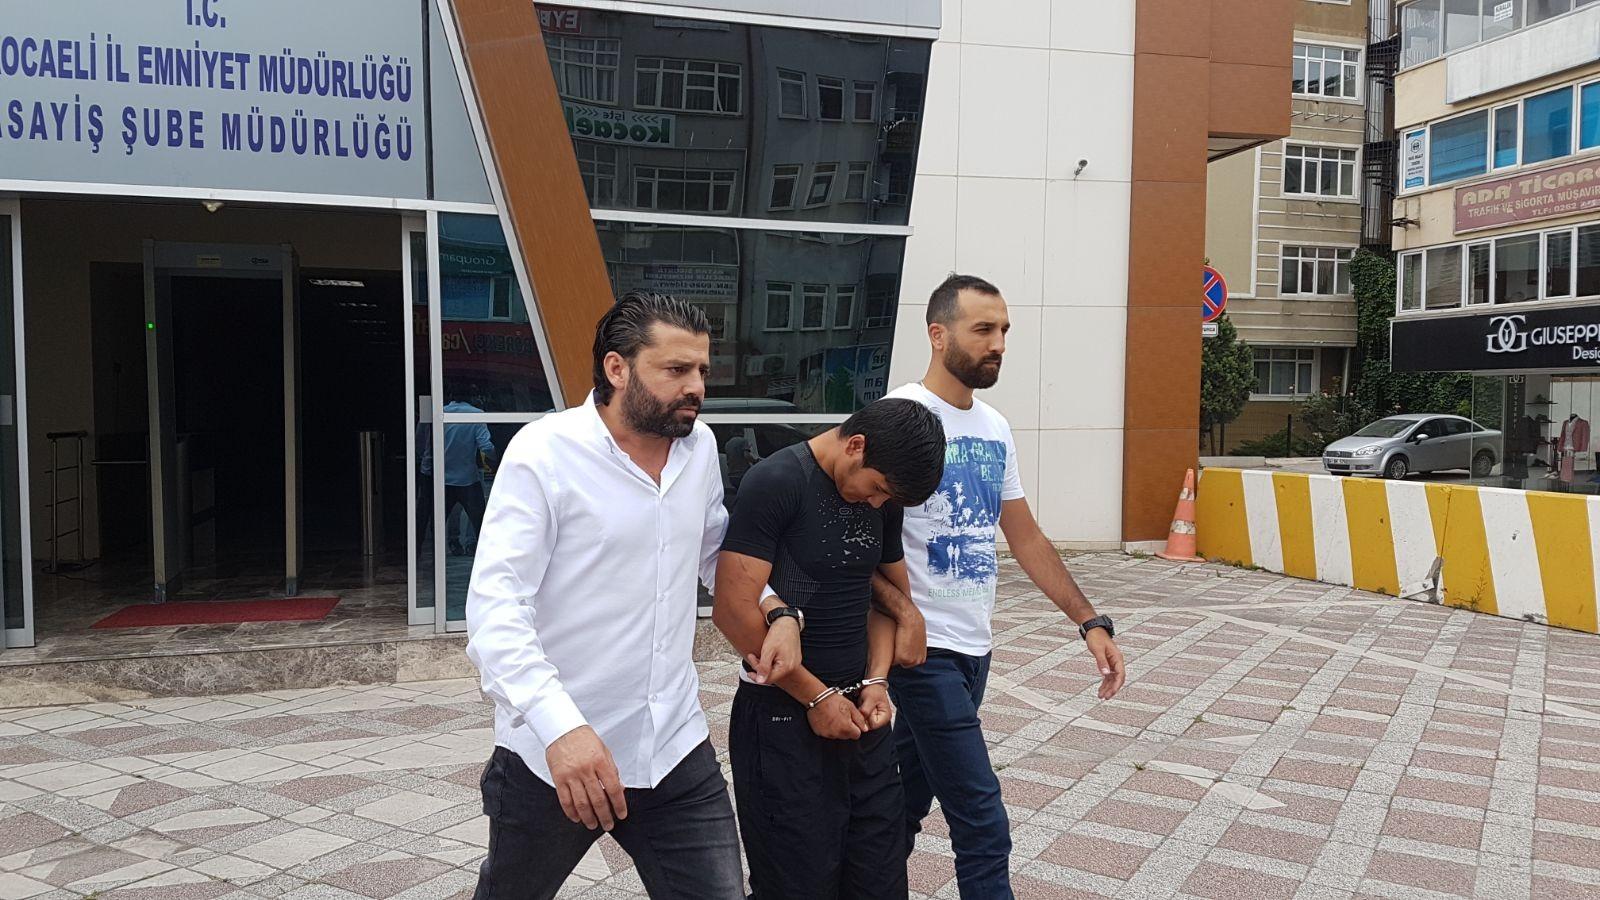 Büfeden 30 bin TL'lik sigara alkol çalan hırsız yakalandı